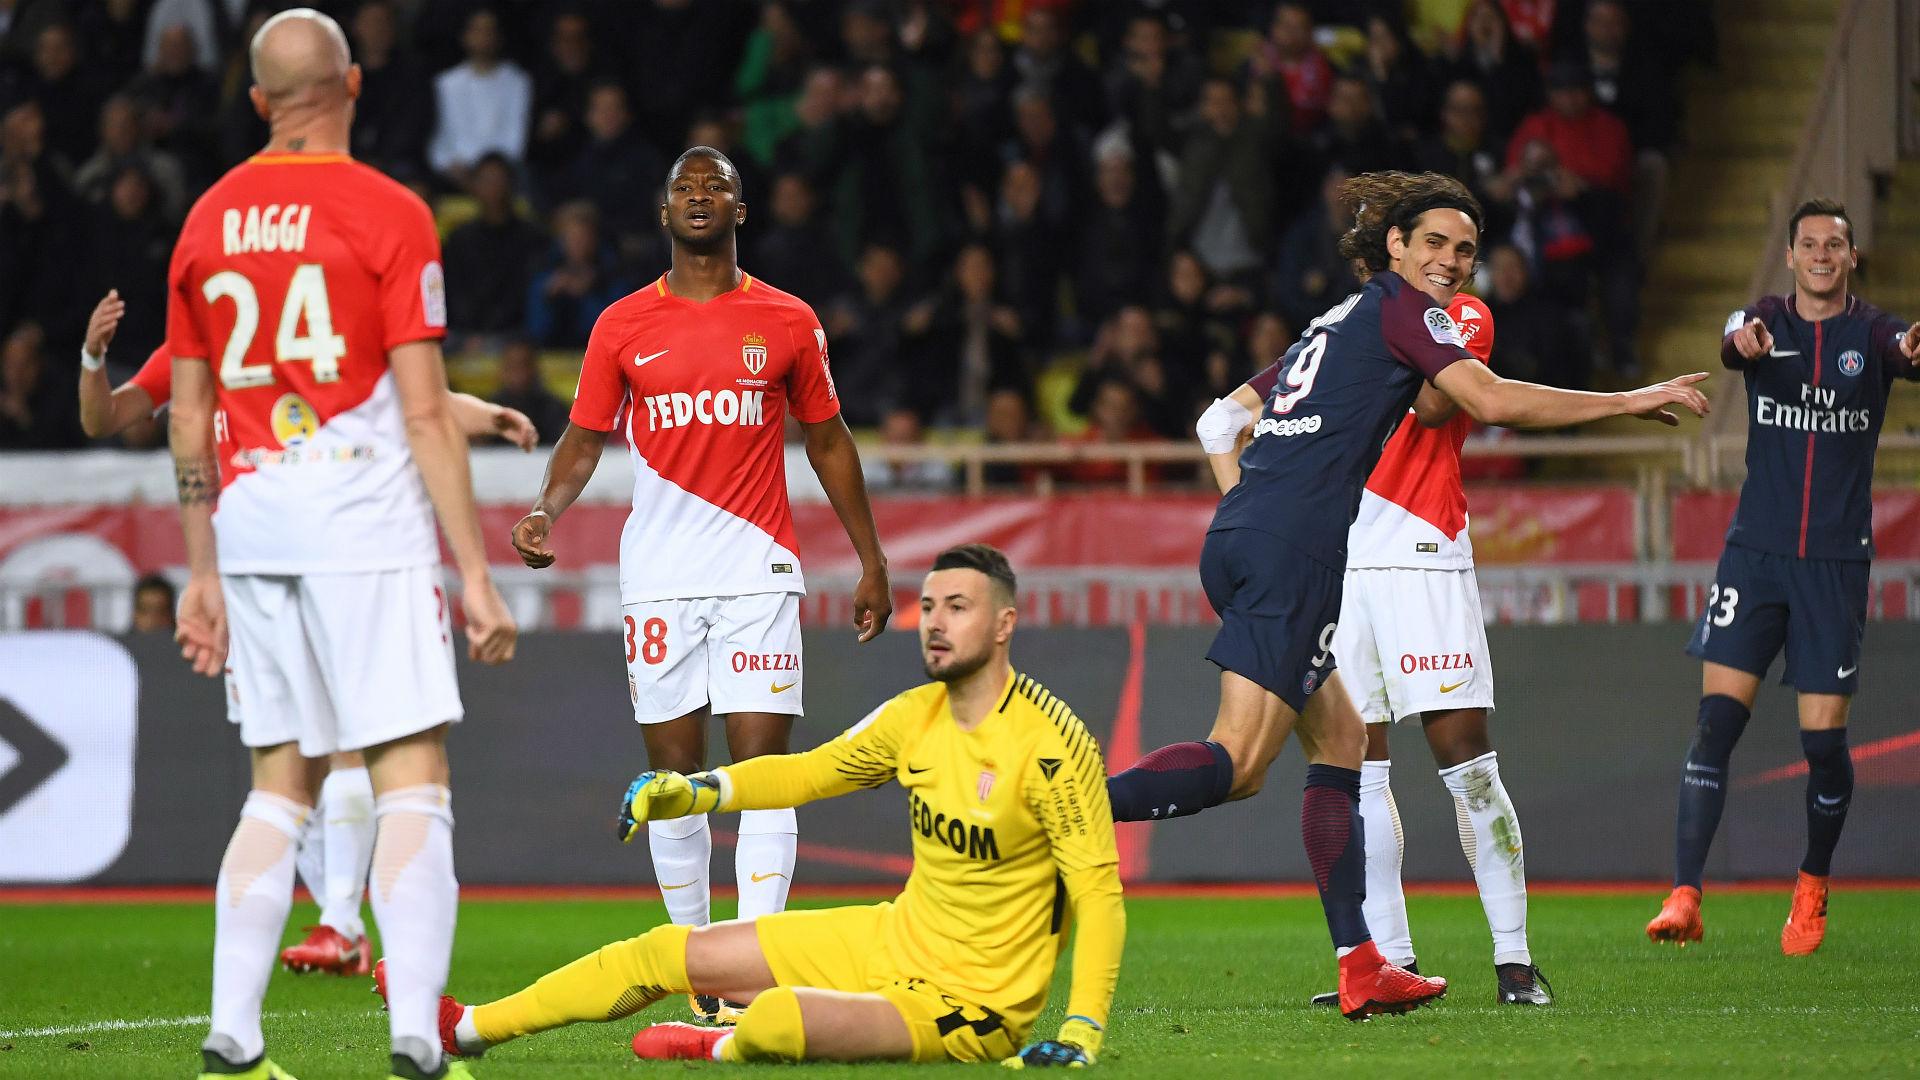 Paris Saint Germain V Monaco Betting Tips Latest Odds Team News Preview And Predictions Goal Com